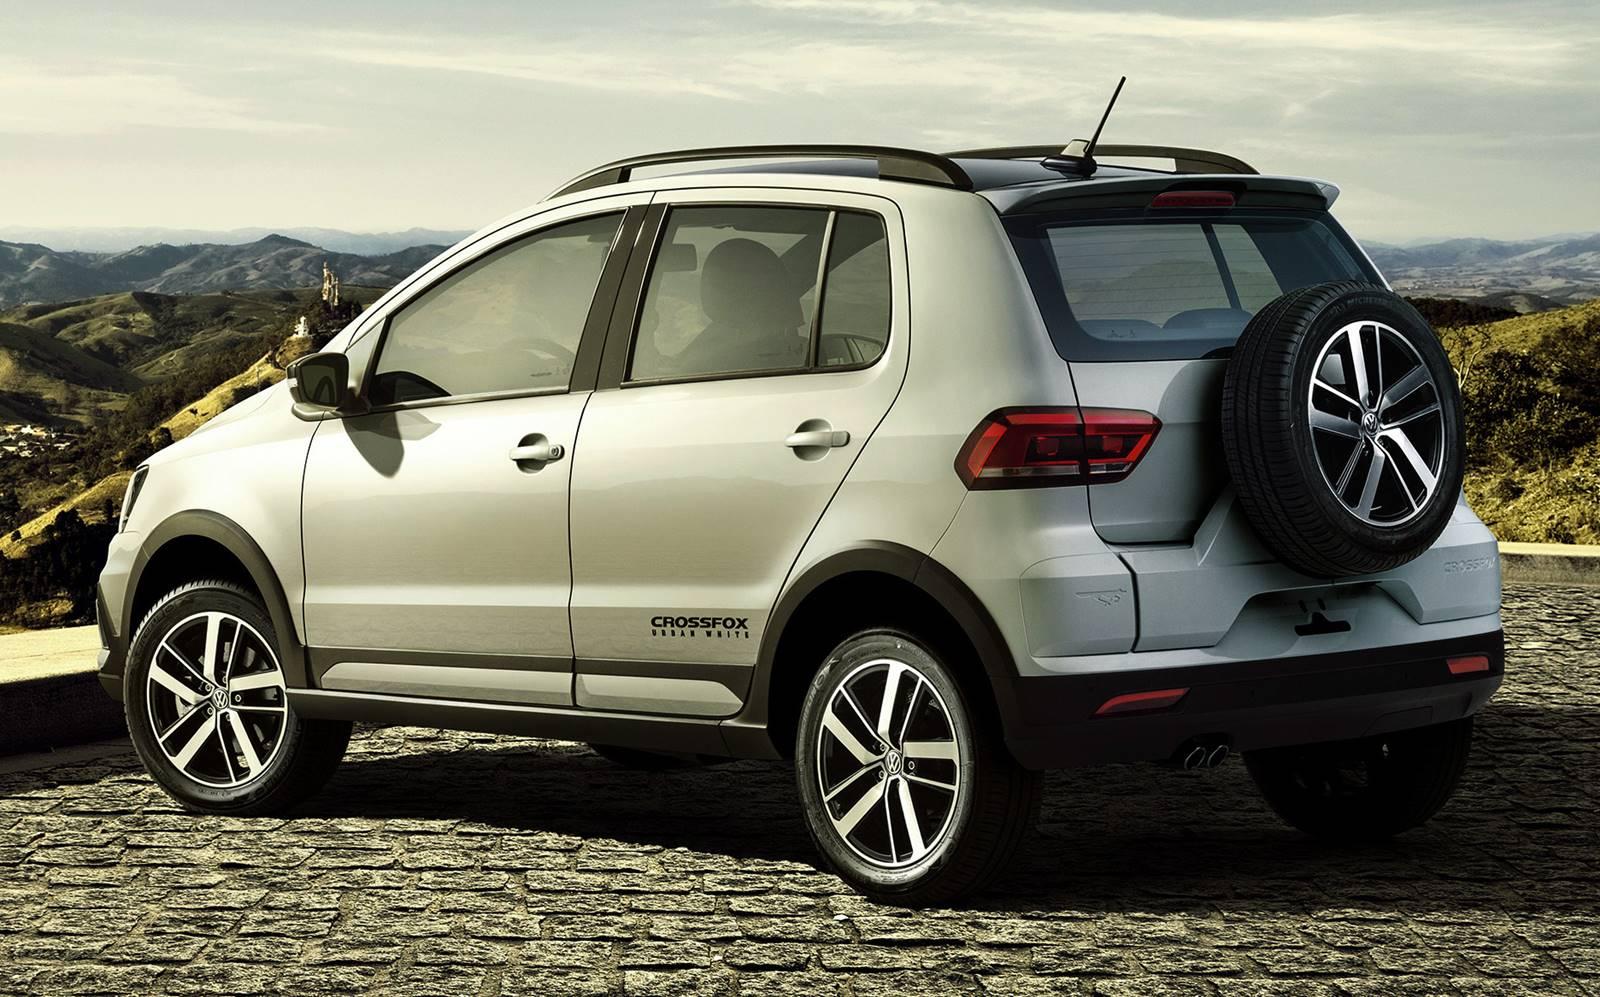 Volkswagen CrossFox 2017 Urban White: fotos e detalhes ...